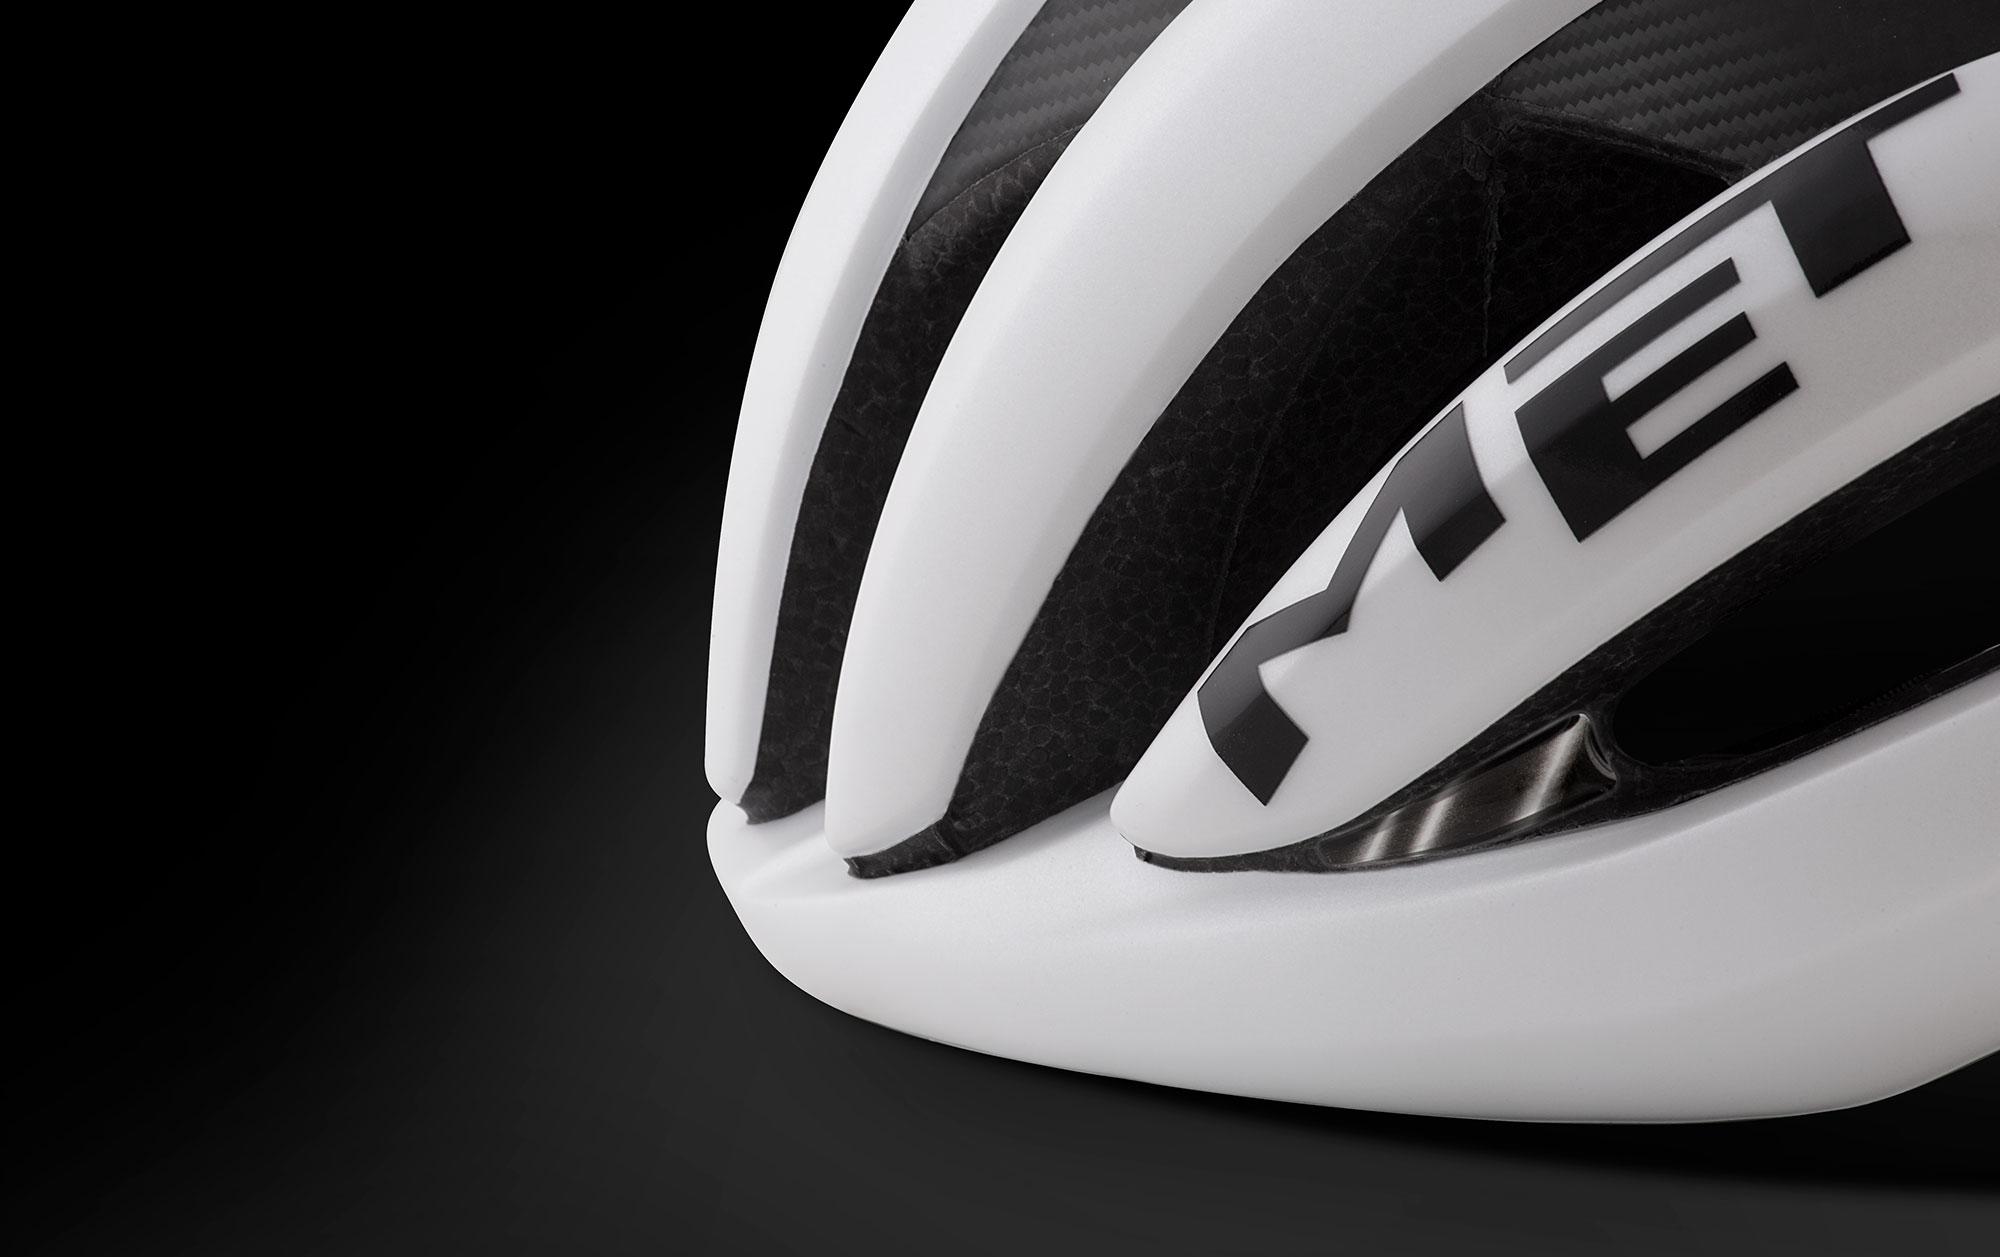 MET Trenta 3K Carbon Road, Aero, Cyclocross and Gravel Helmet sunglasses ports